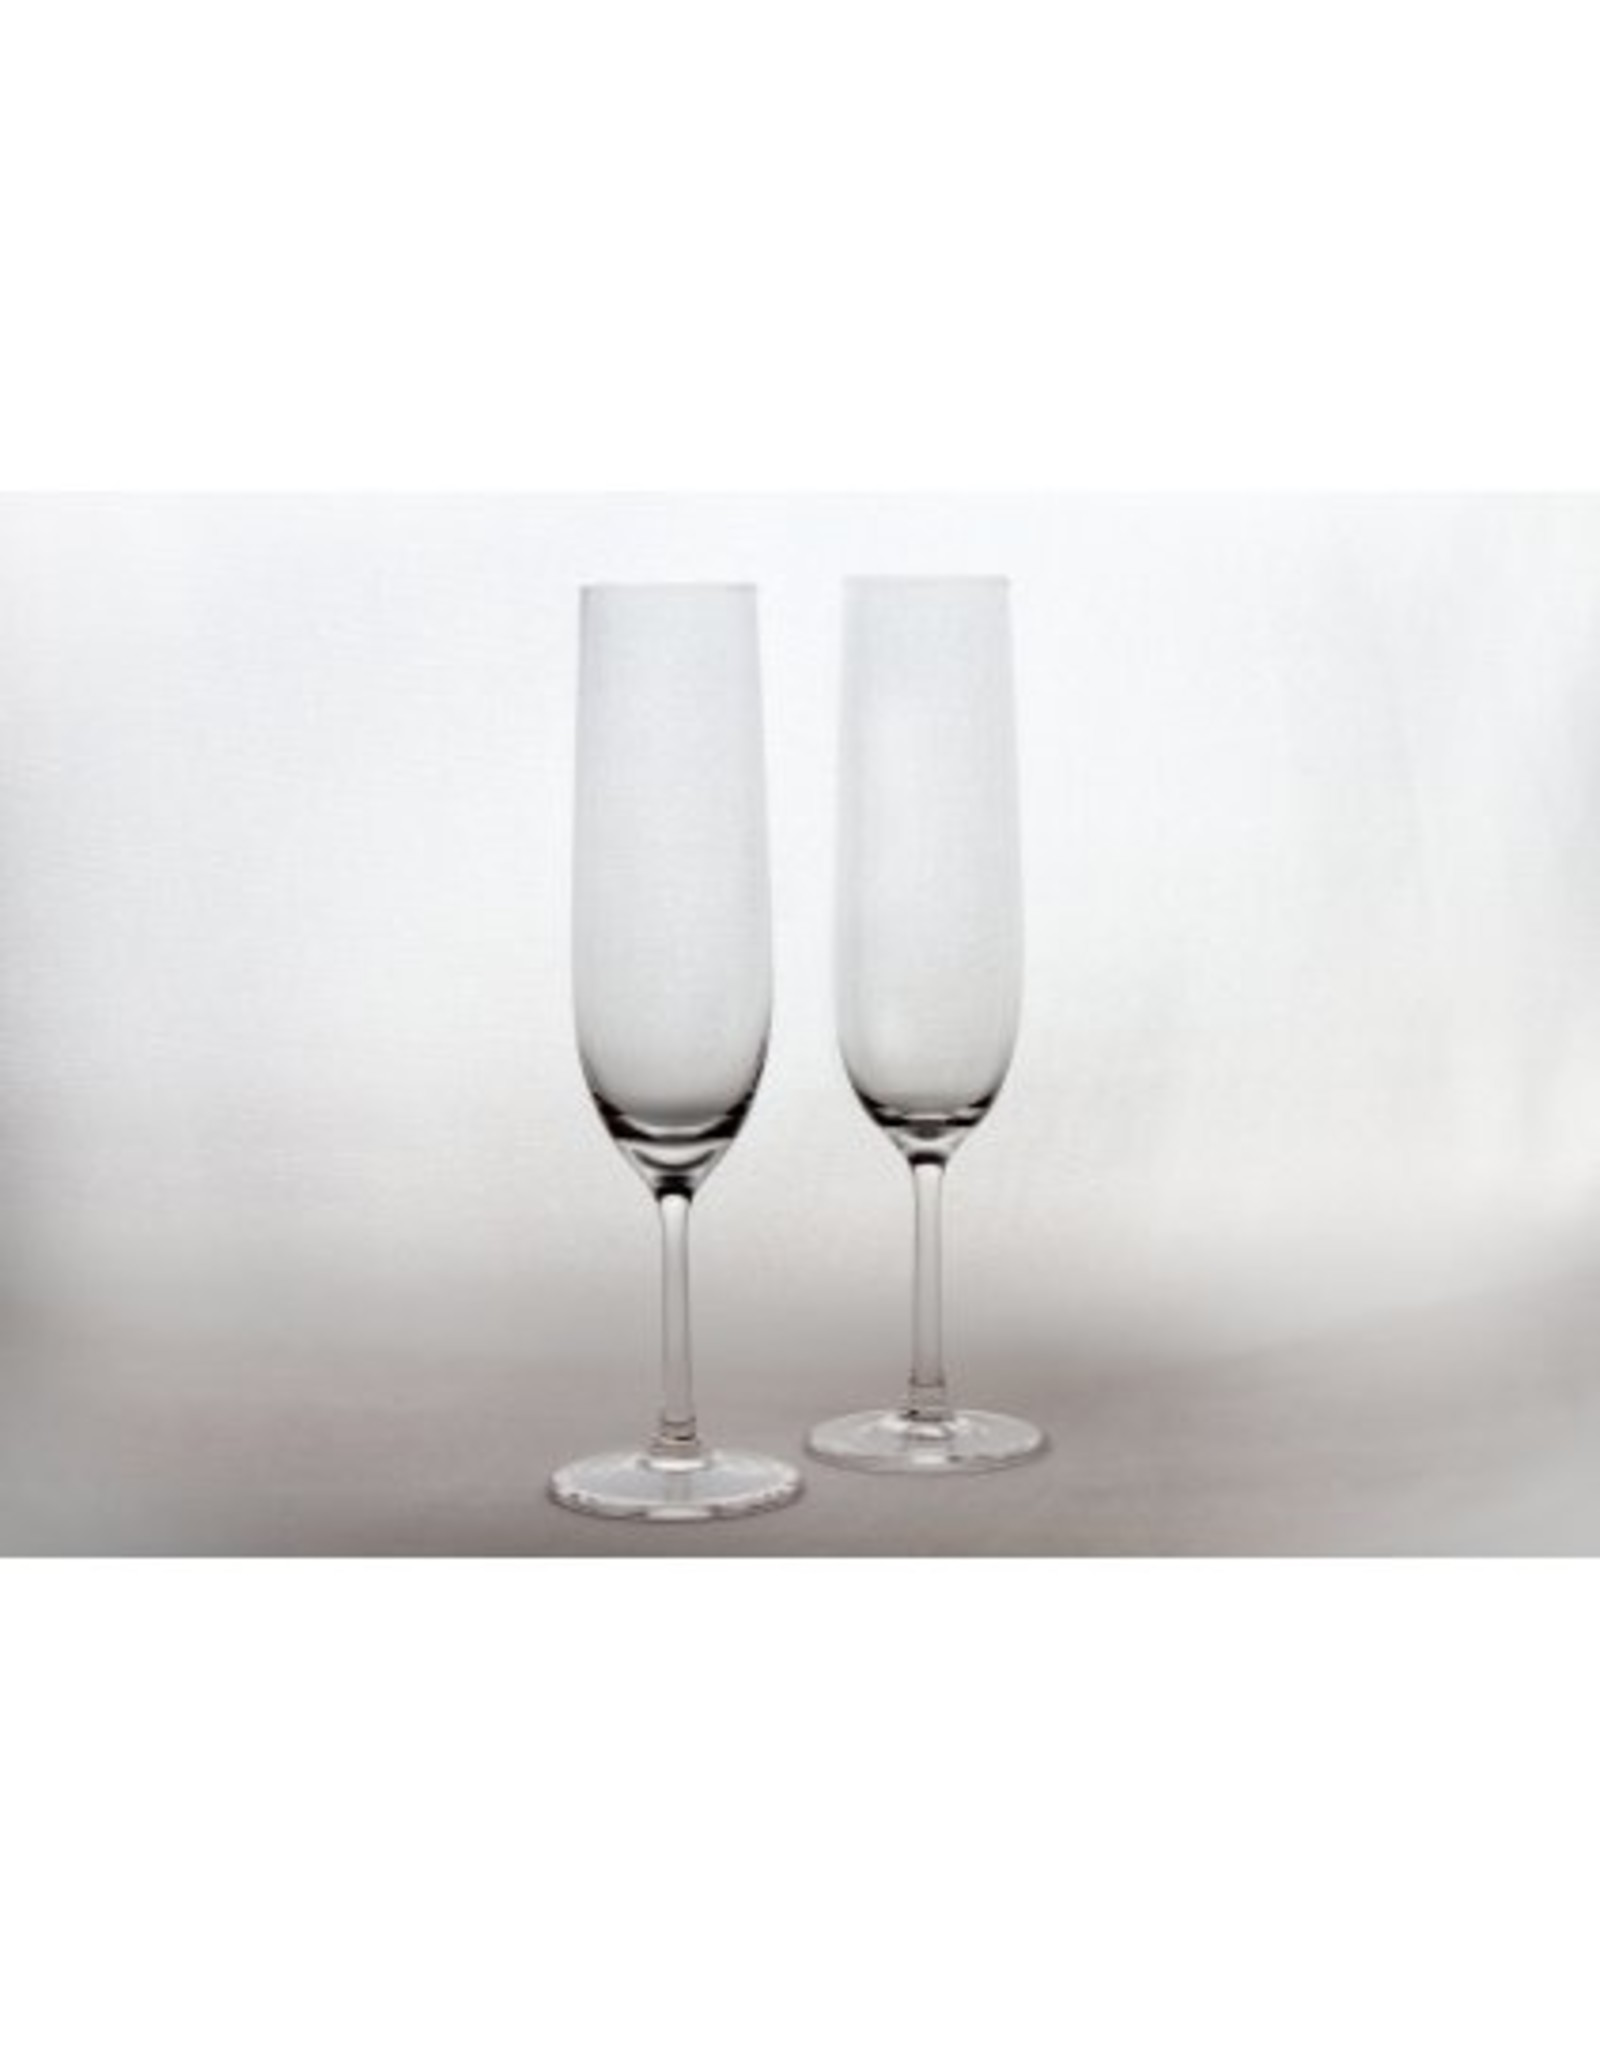 Skloglass Slim elegance champagneglas  / 2st